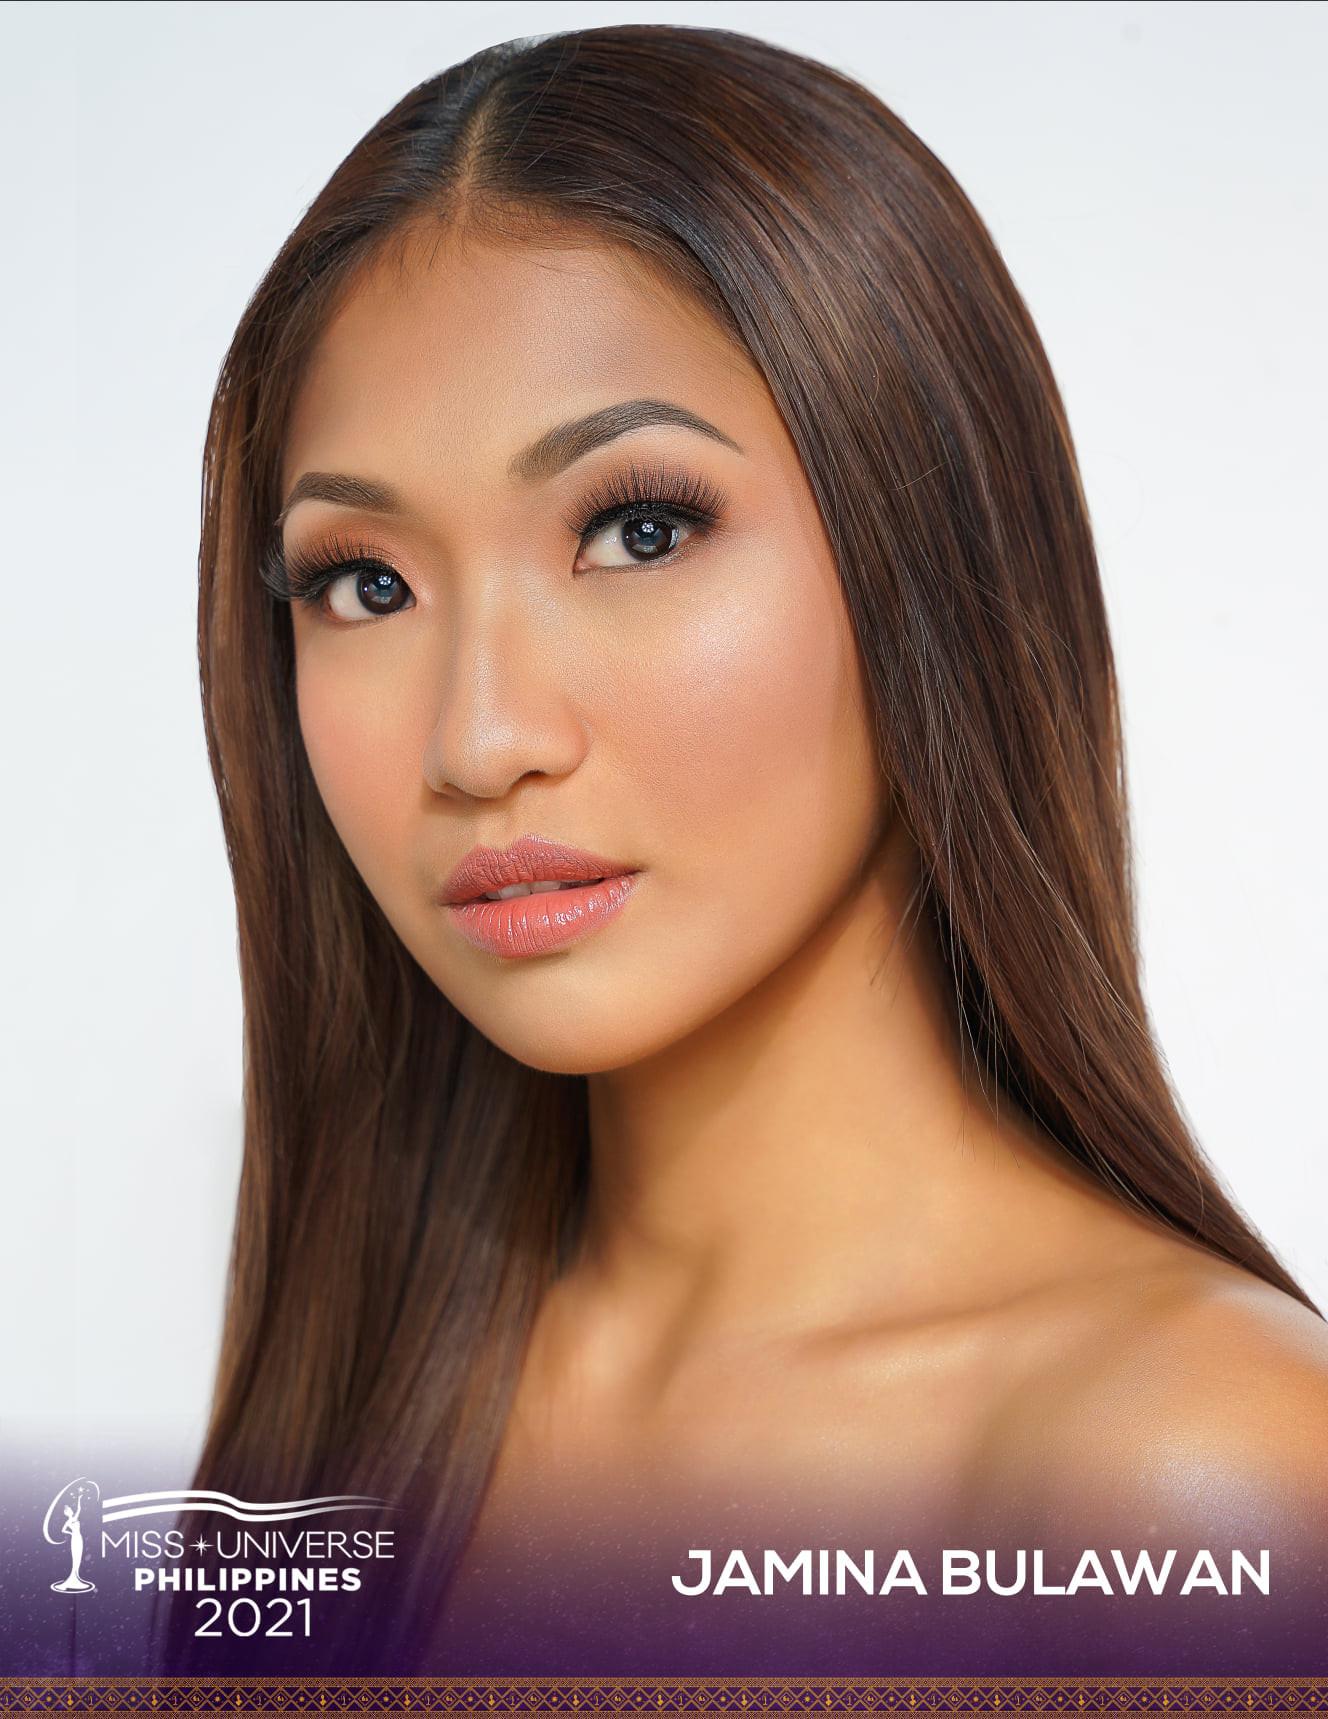 pre-candidatas a miss universe philippines 2021. - Página 3 Alquwu